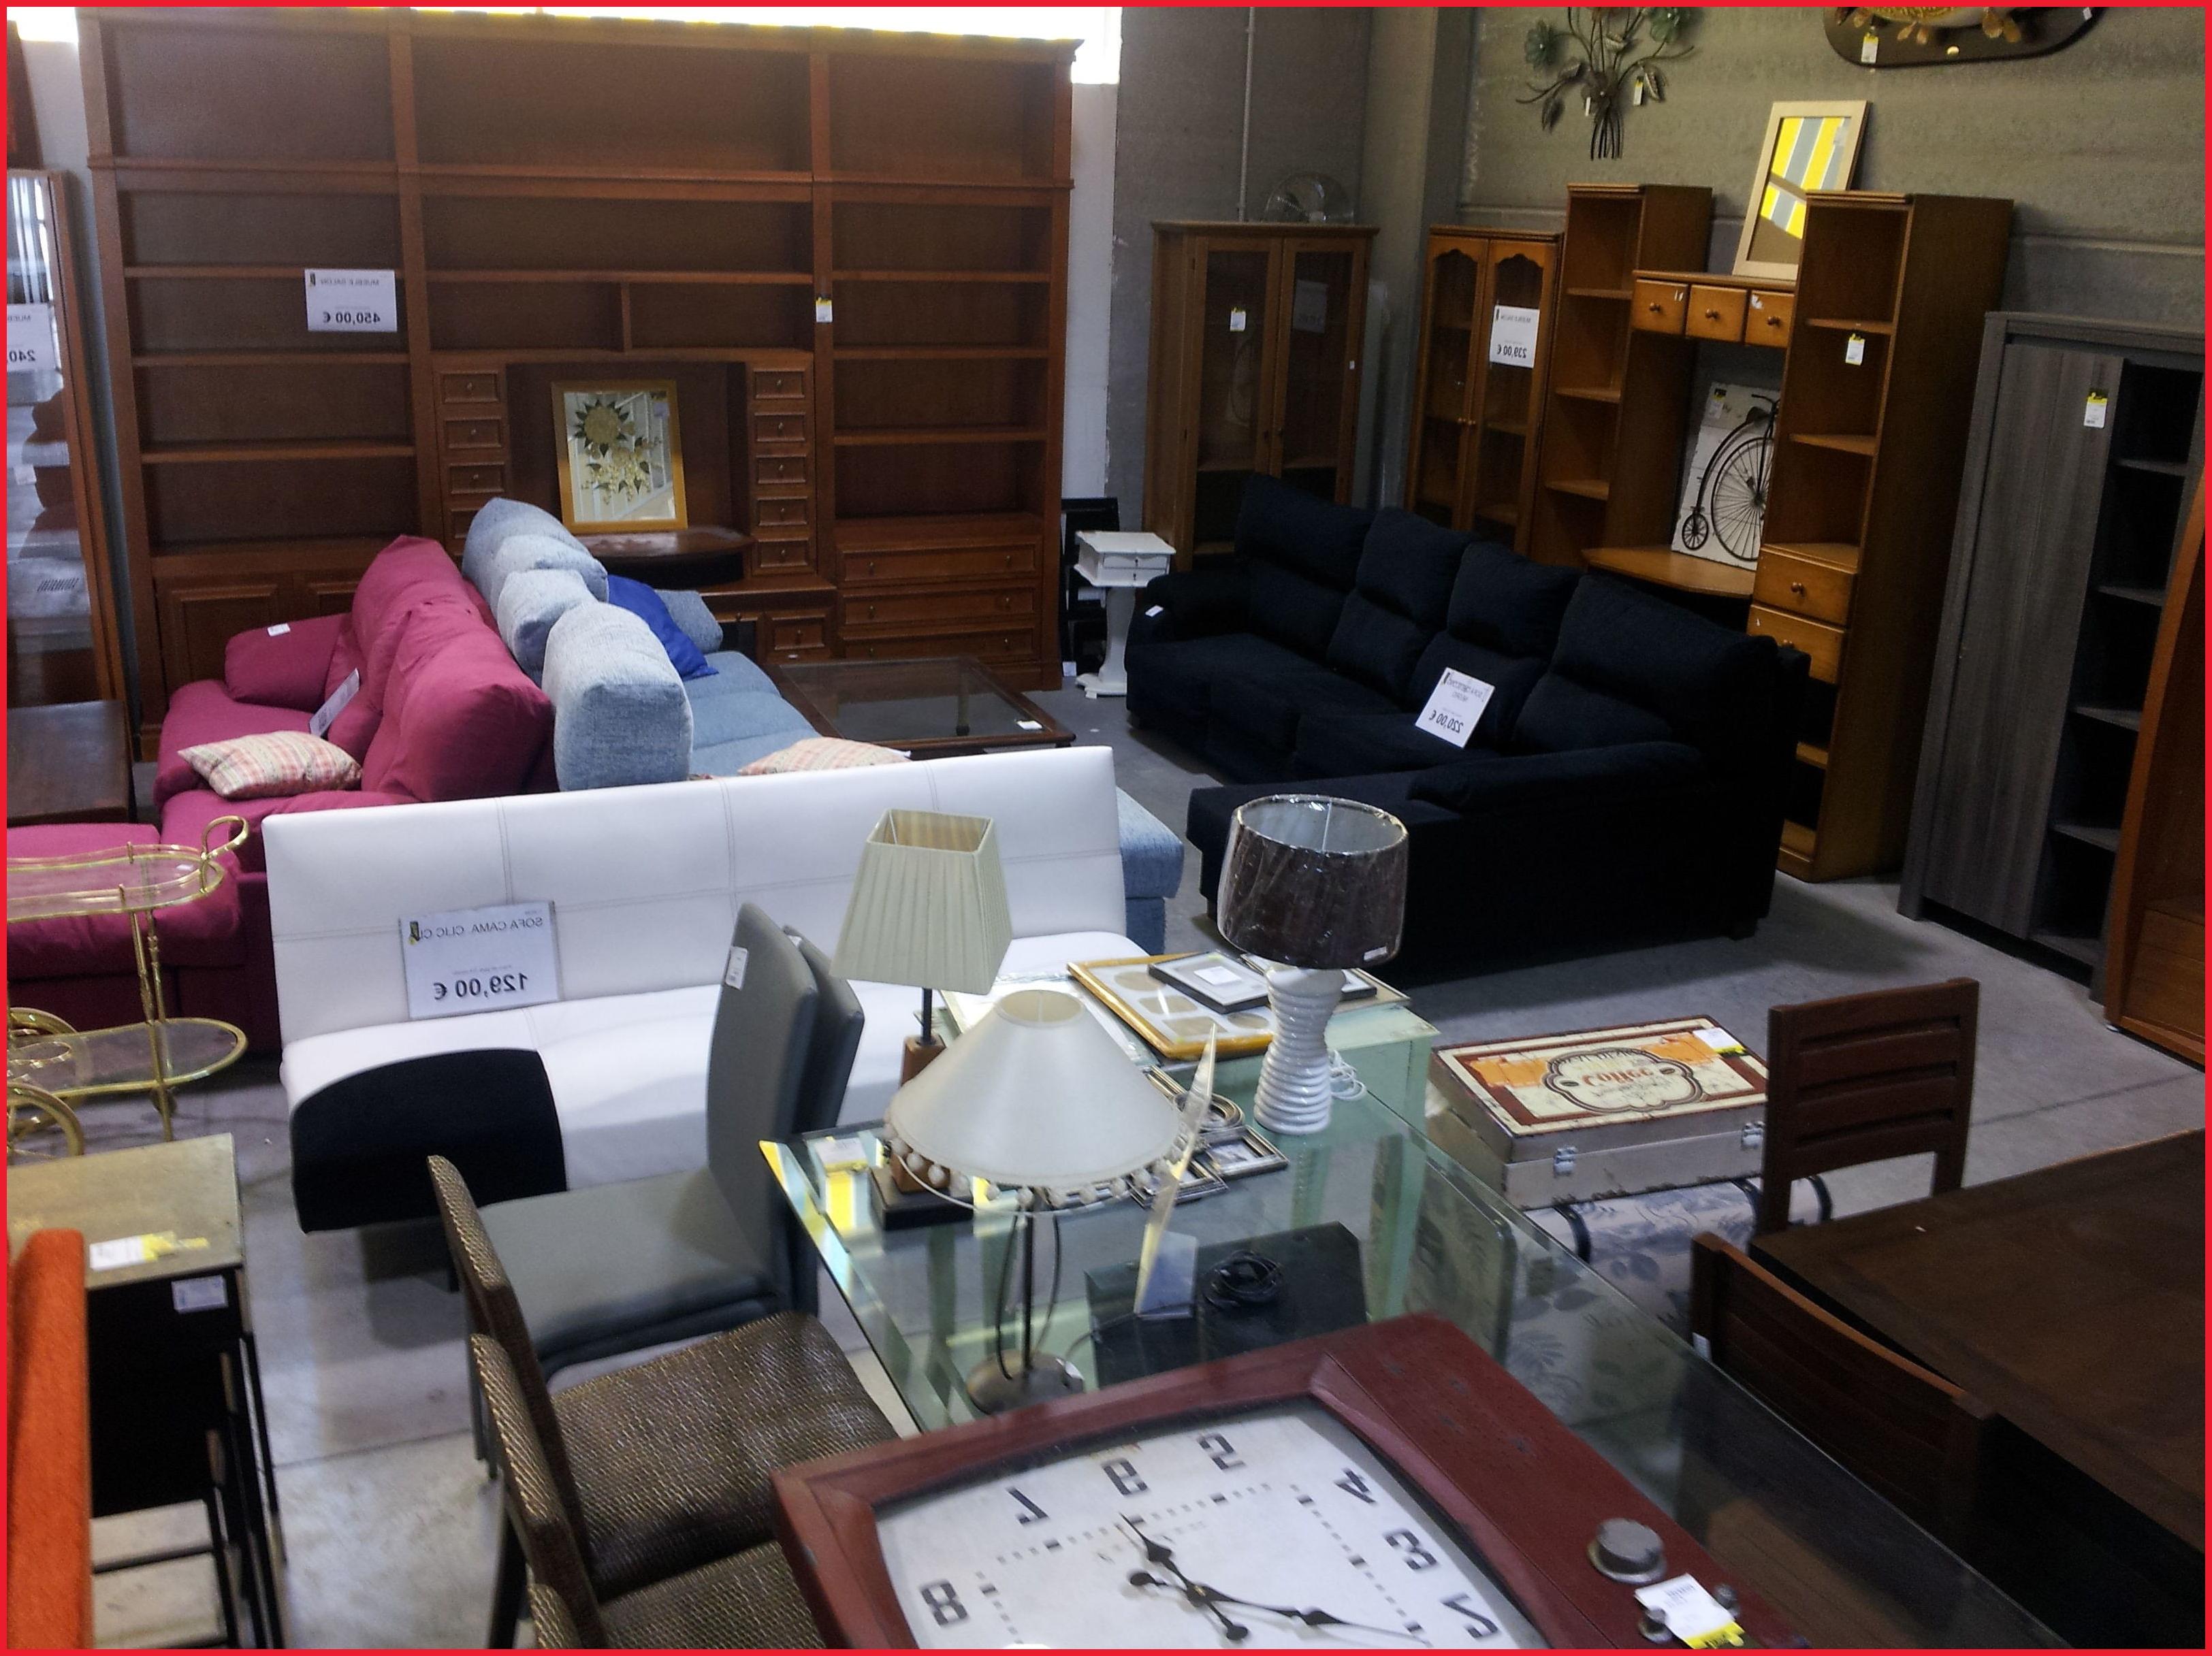 Compra Venta Muebles Usados Drdp Pra Venta De Muebles Usados Vender Muebles Usados Madrid